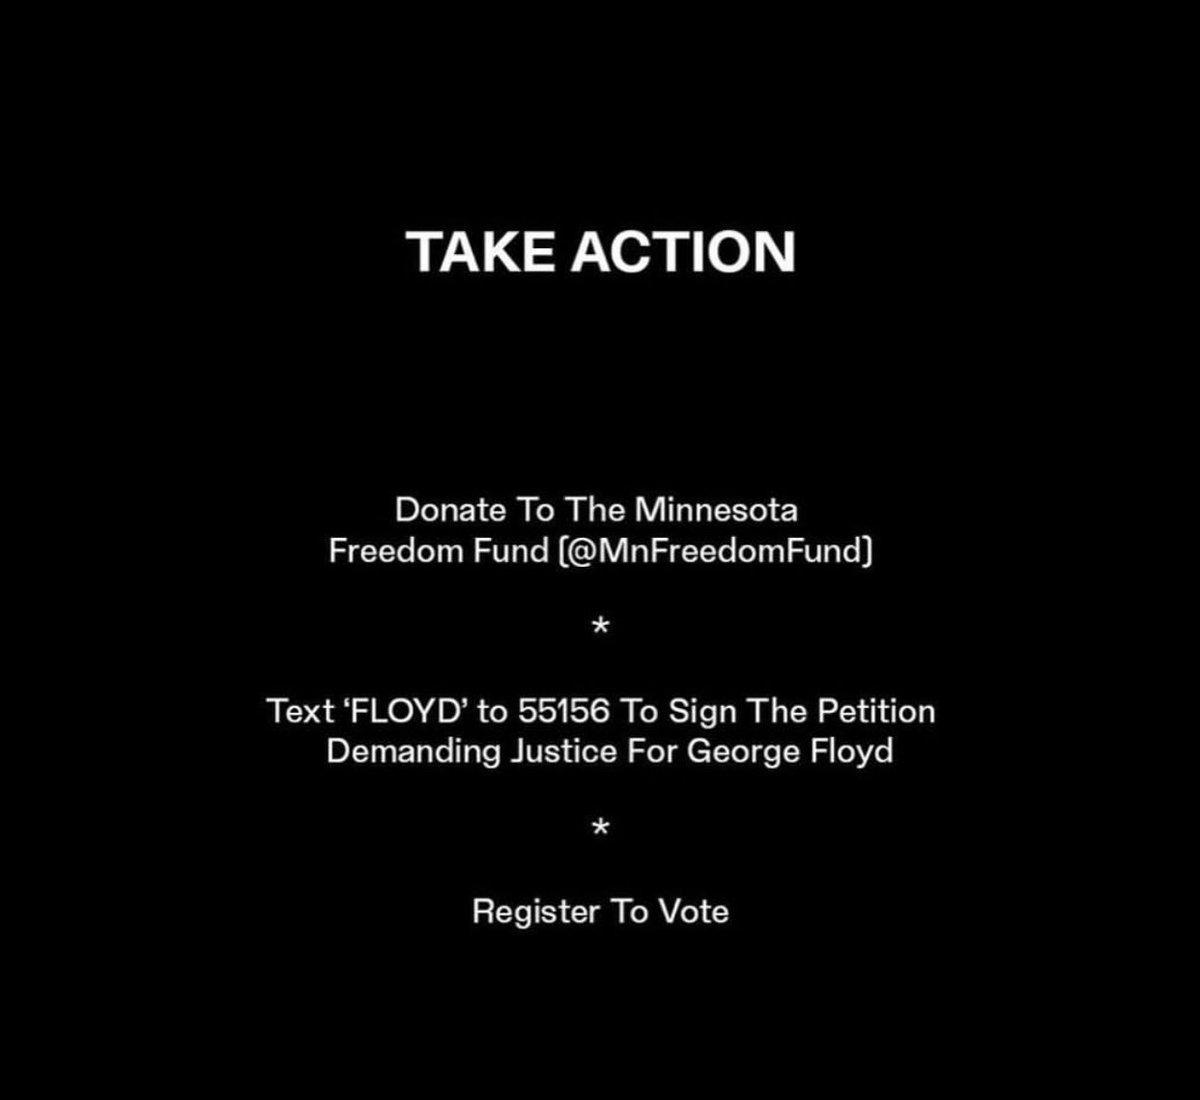 #TakeAction #ArrestAllFour #RegisterToVote #JusticeForGeorgeFlyod https://t.co/LZ6gh0sDLH